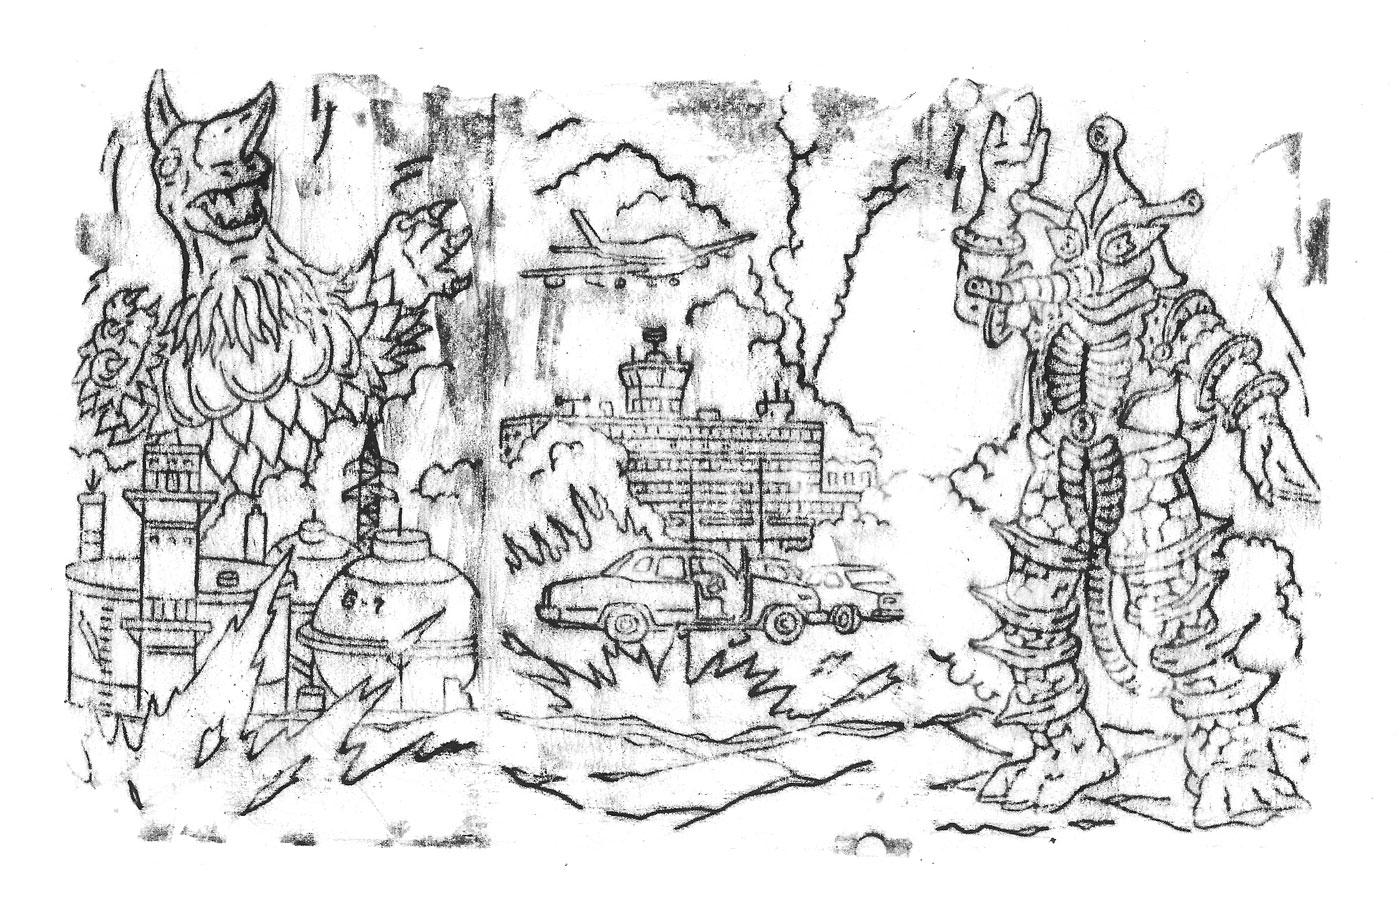 le mythe Godzilla décryptage dessin